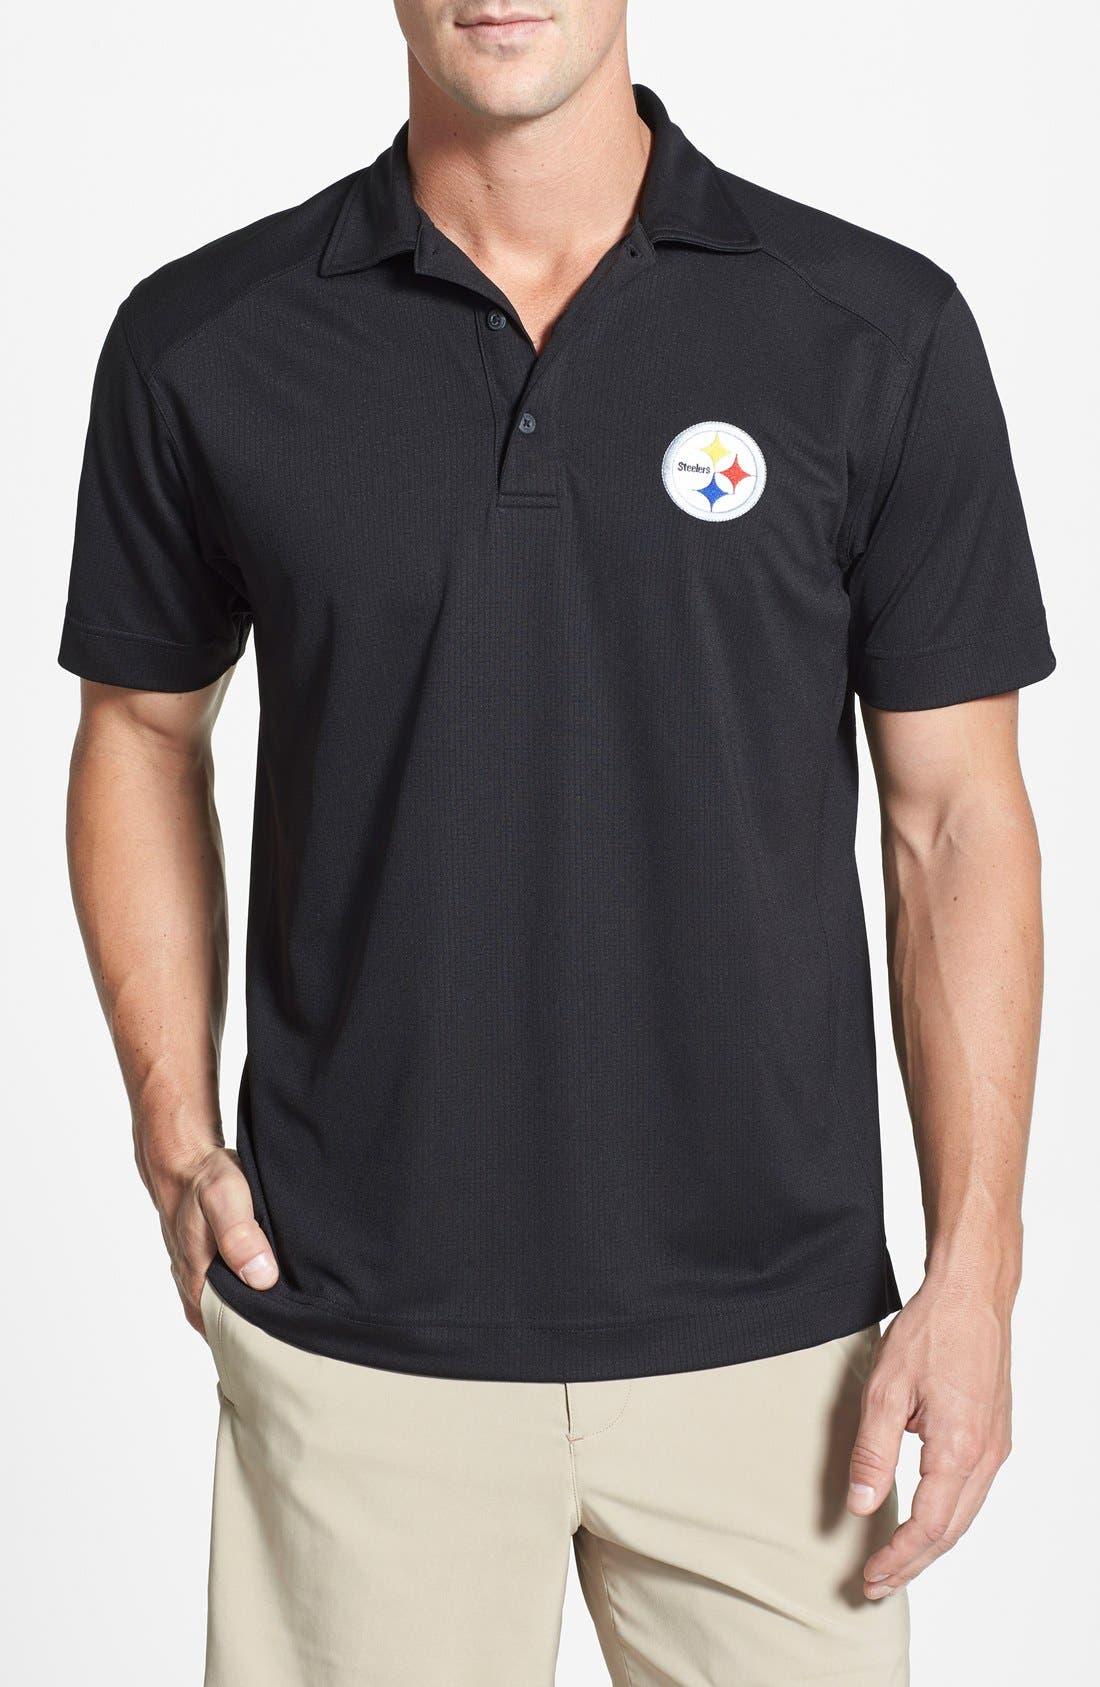 Cutter & Buck 'Pittsburgh Steelers - Genre' DryTec Moisture Wicking Polo (Big & Tall)